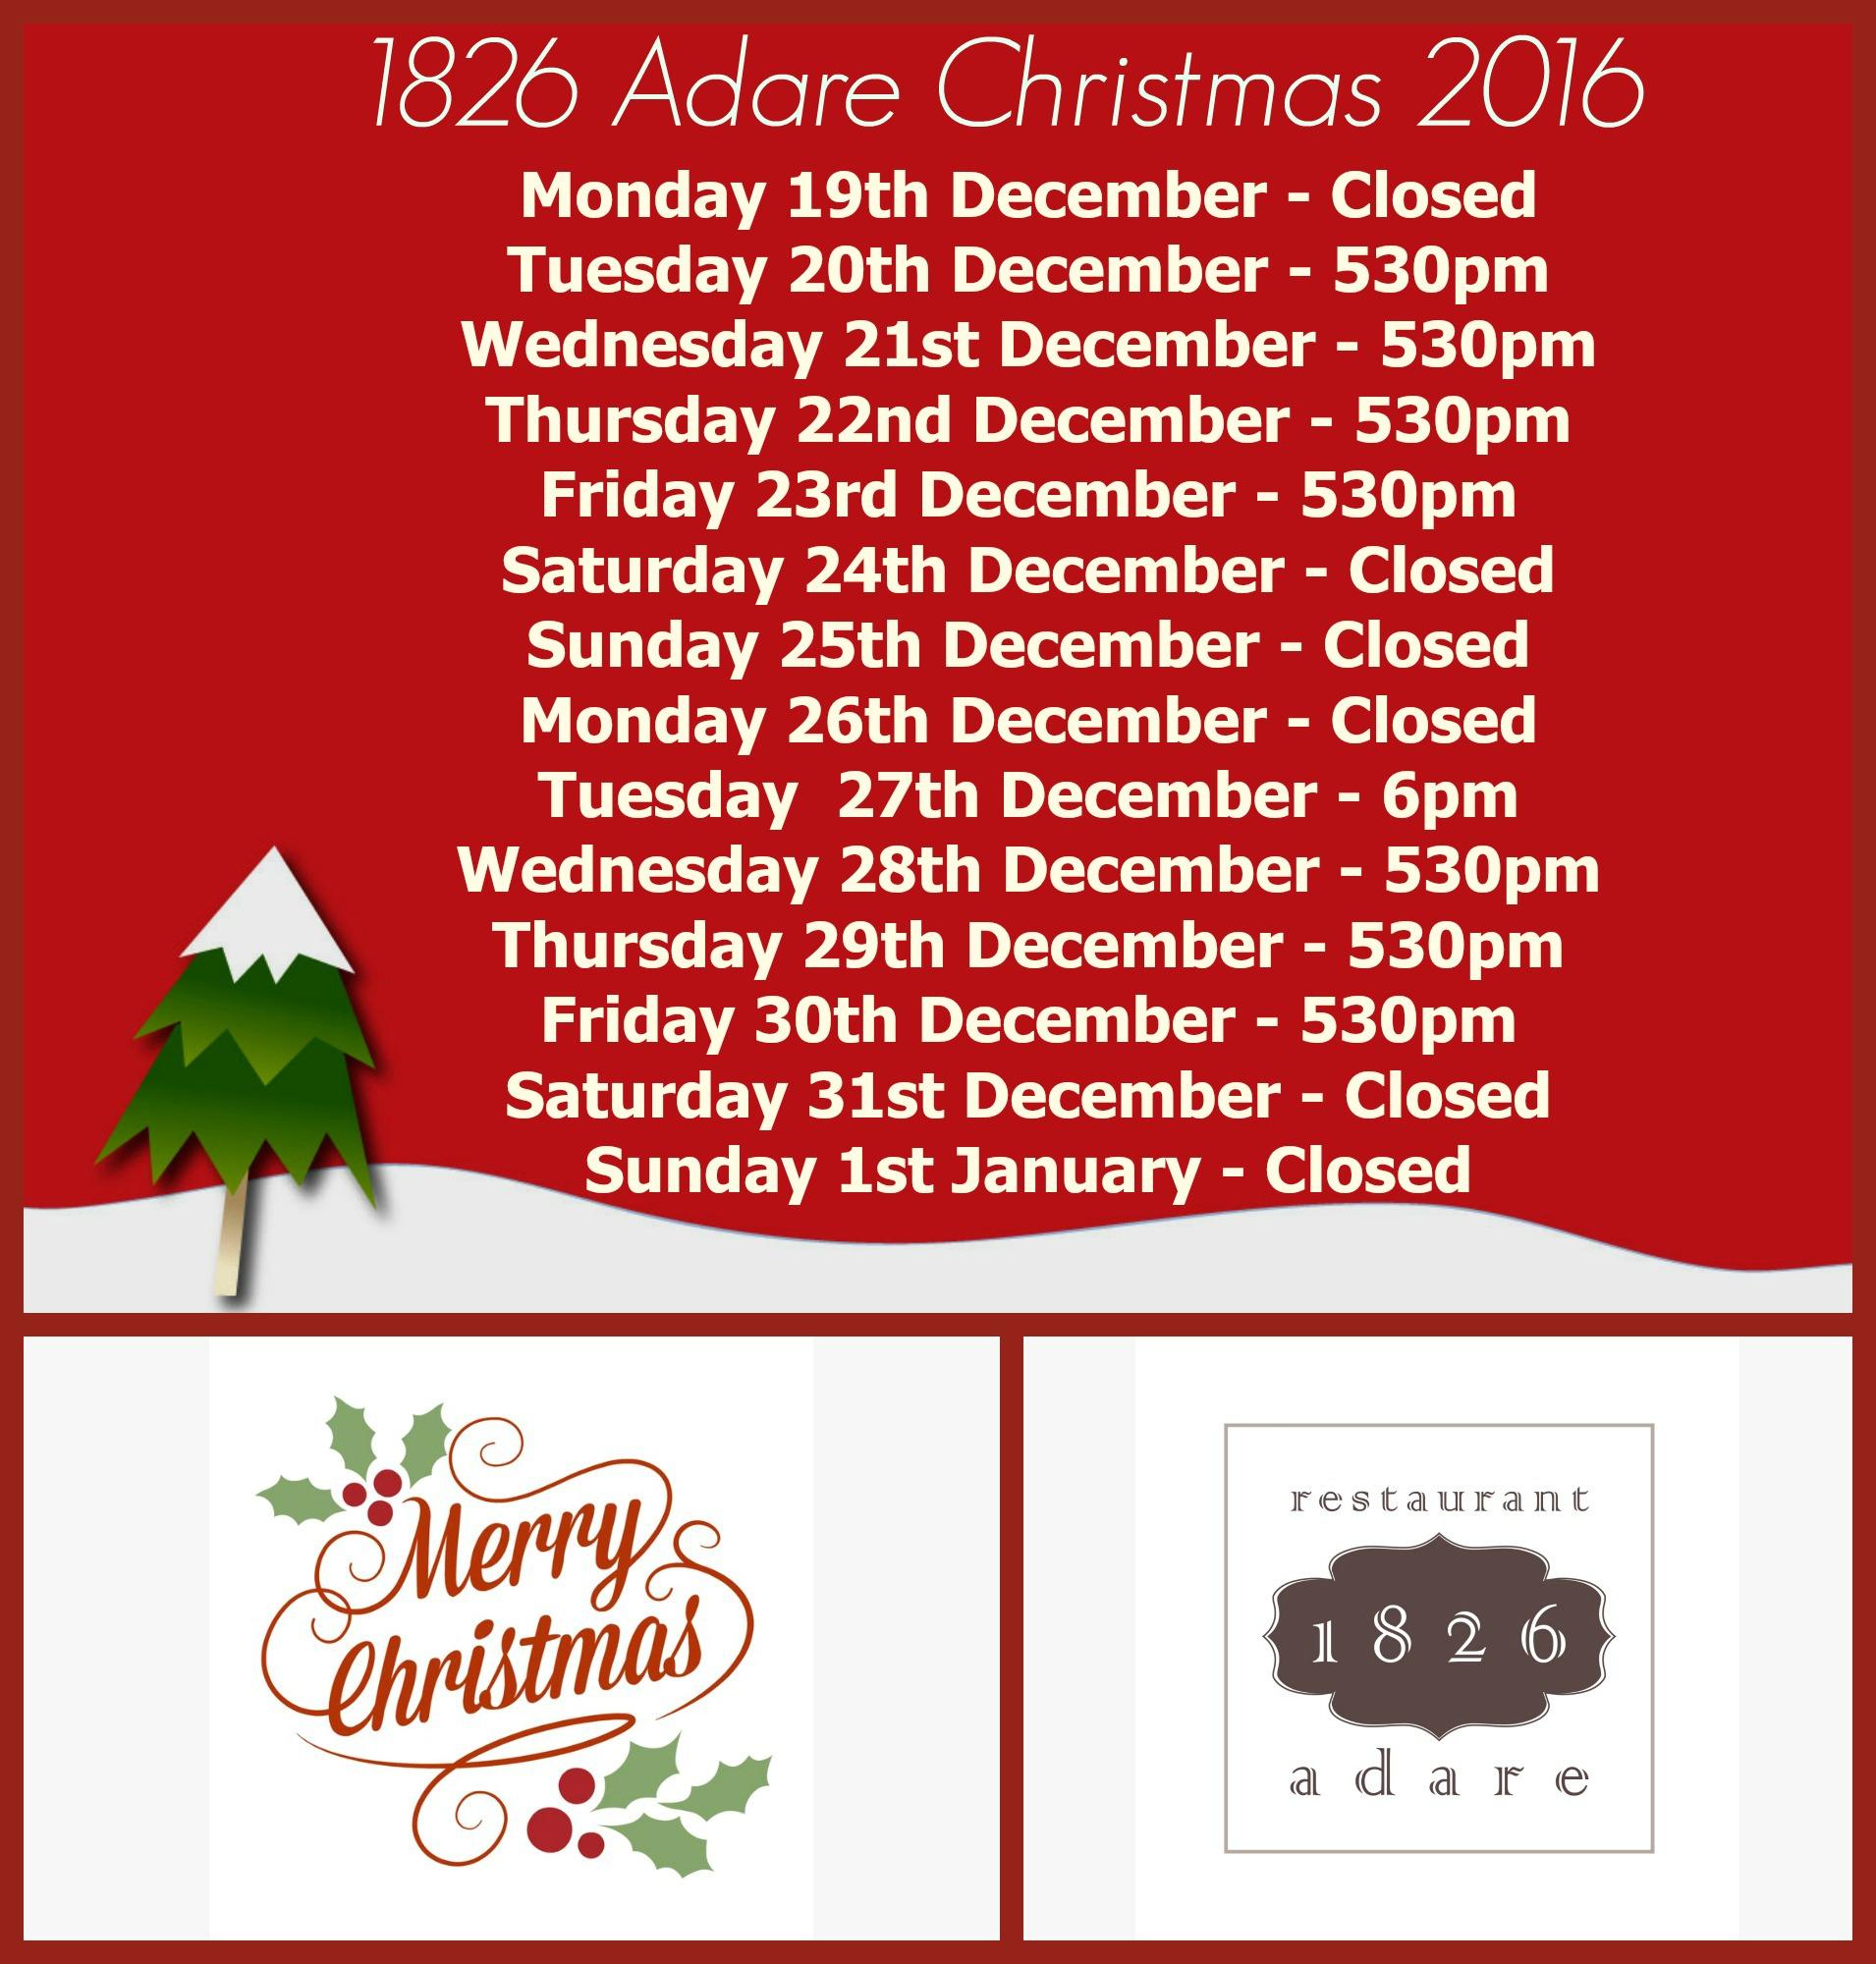 1826 Adare, Best Restaurant in Limerick & Munster. Proprietors ...